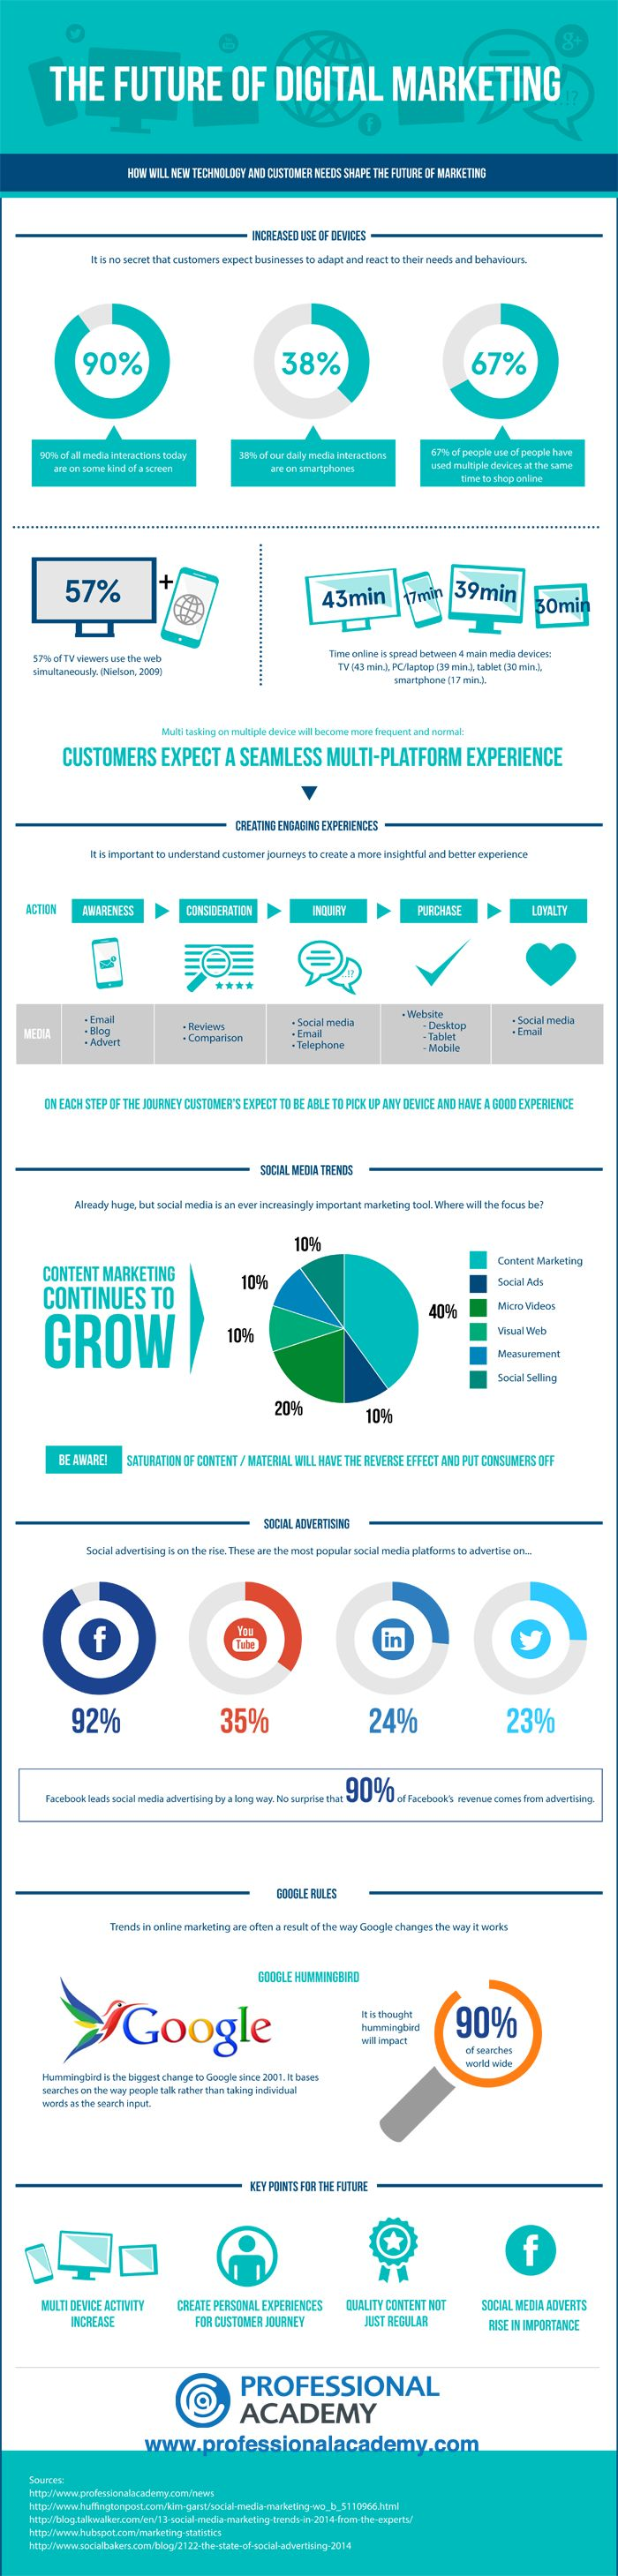 Future of digital marketing infographic